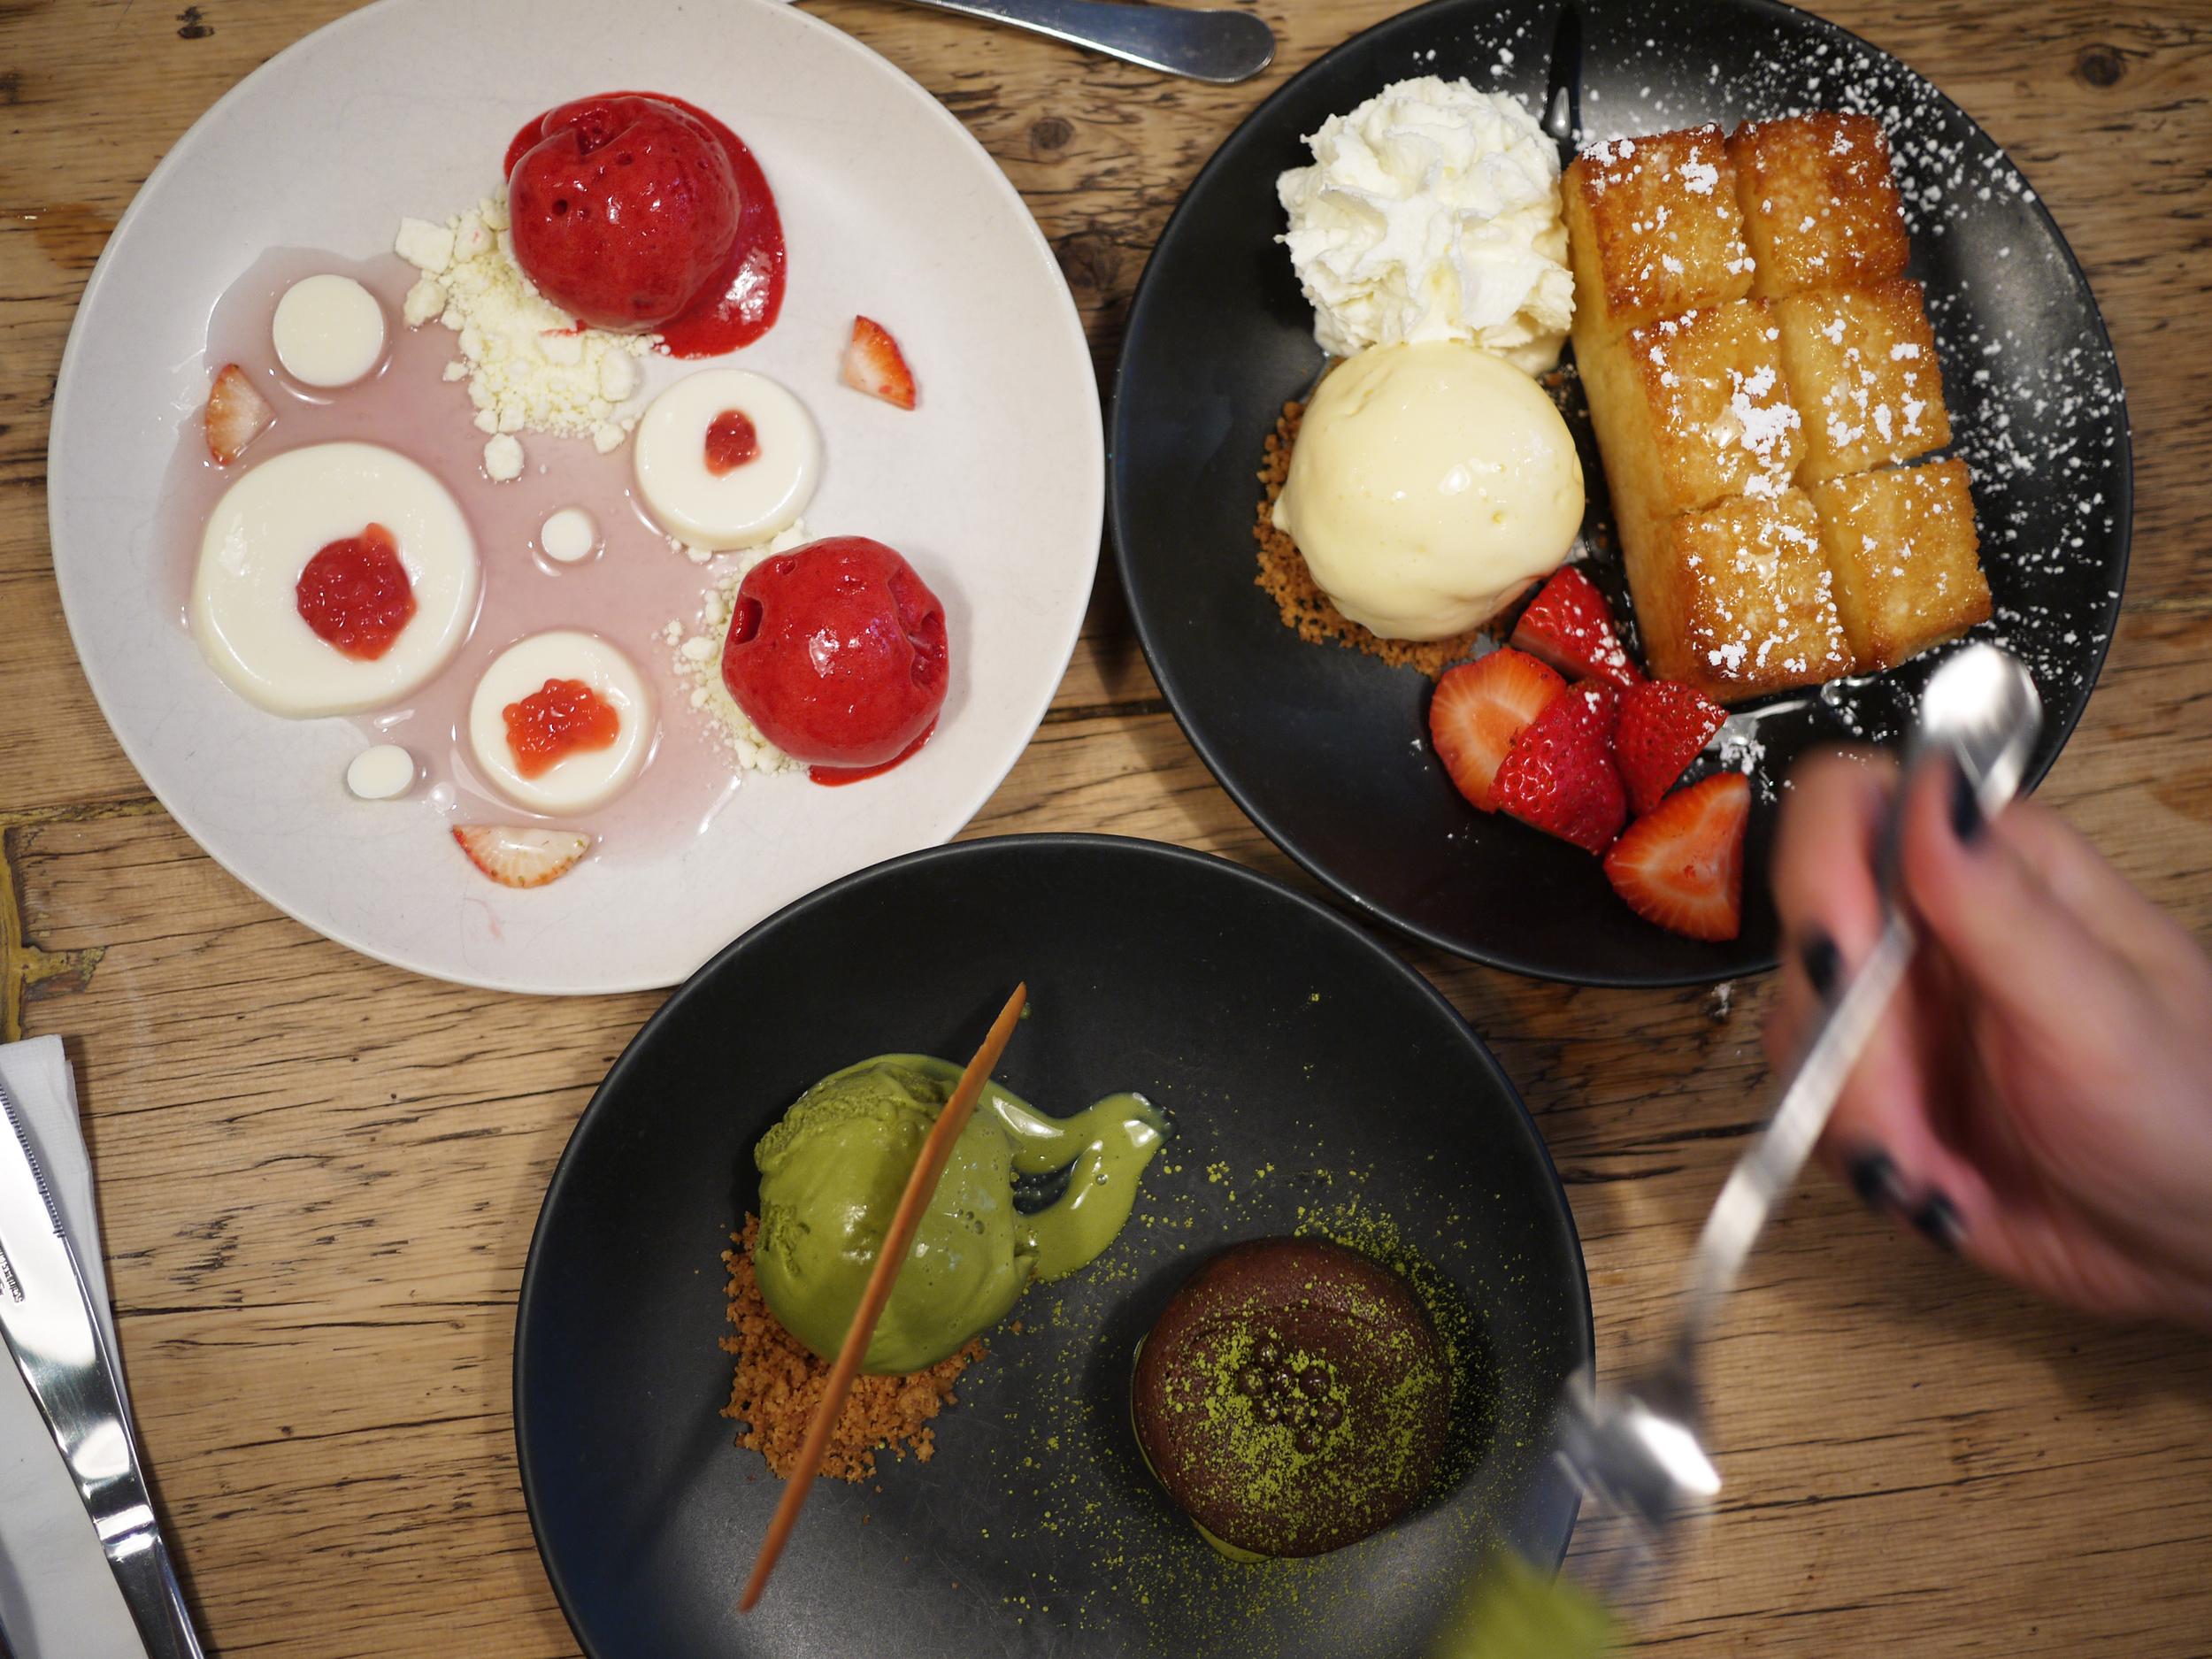 top L: lychee panna cotta, top R: golden toast, bottom: green tea lava cake